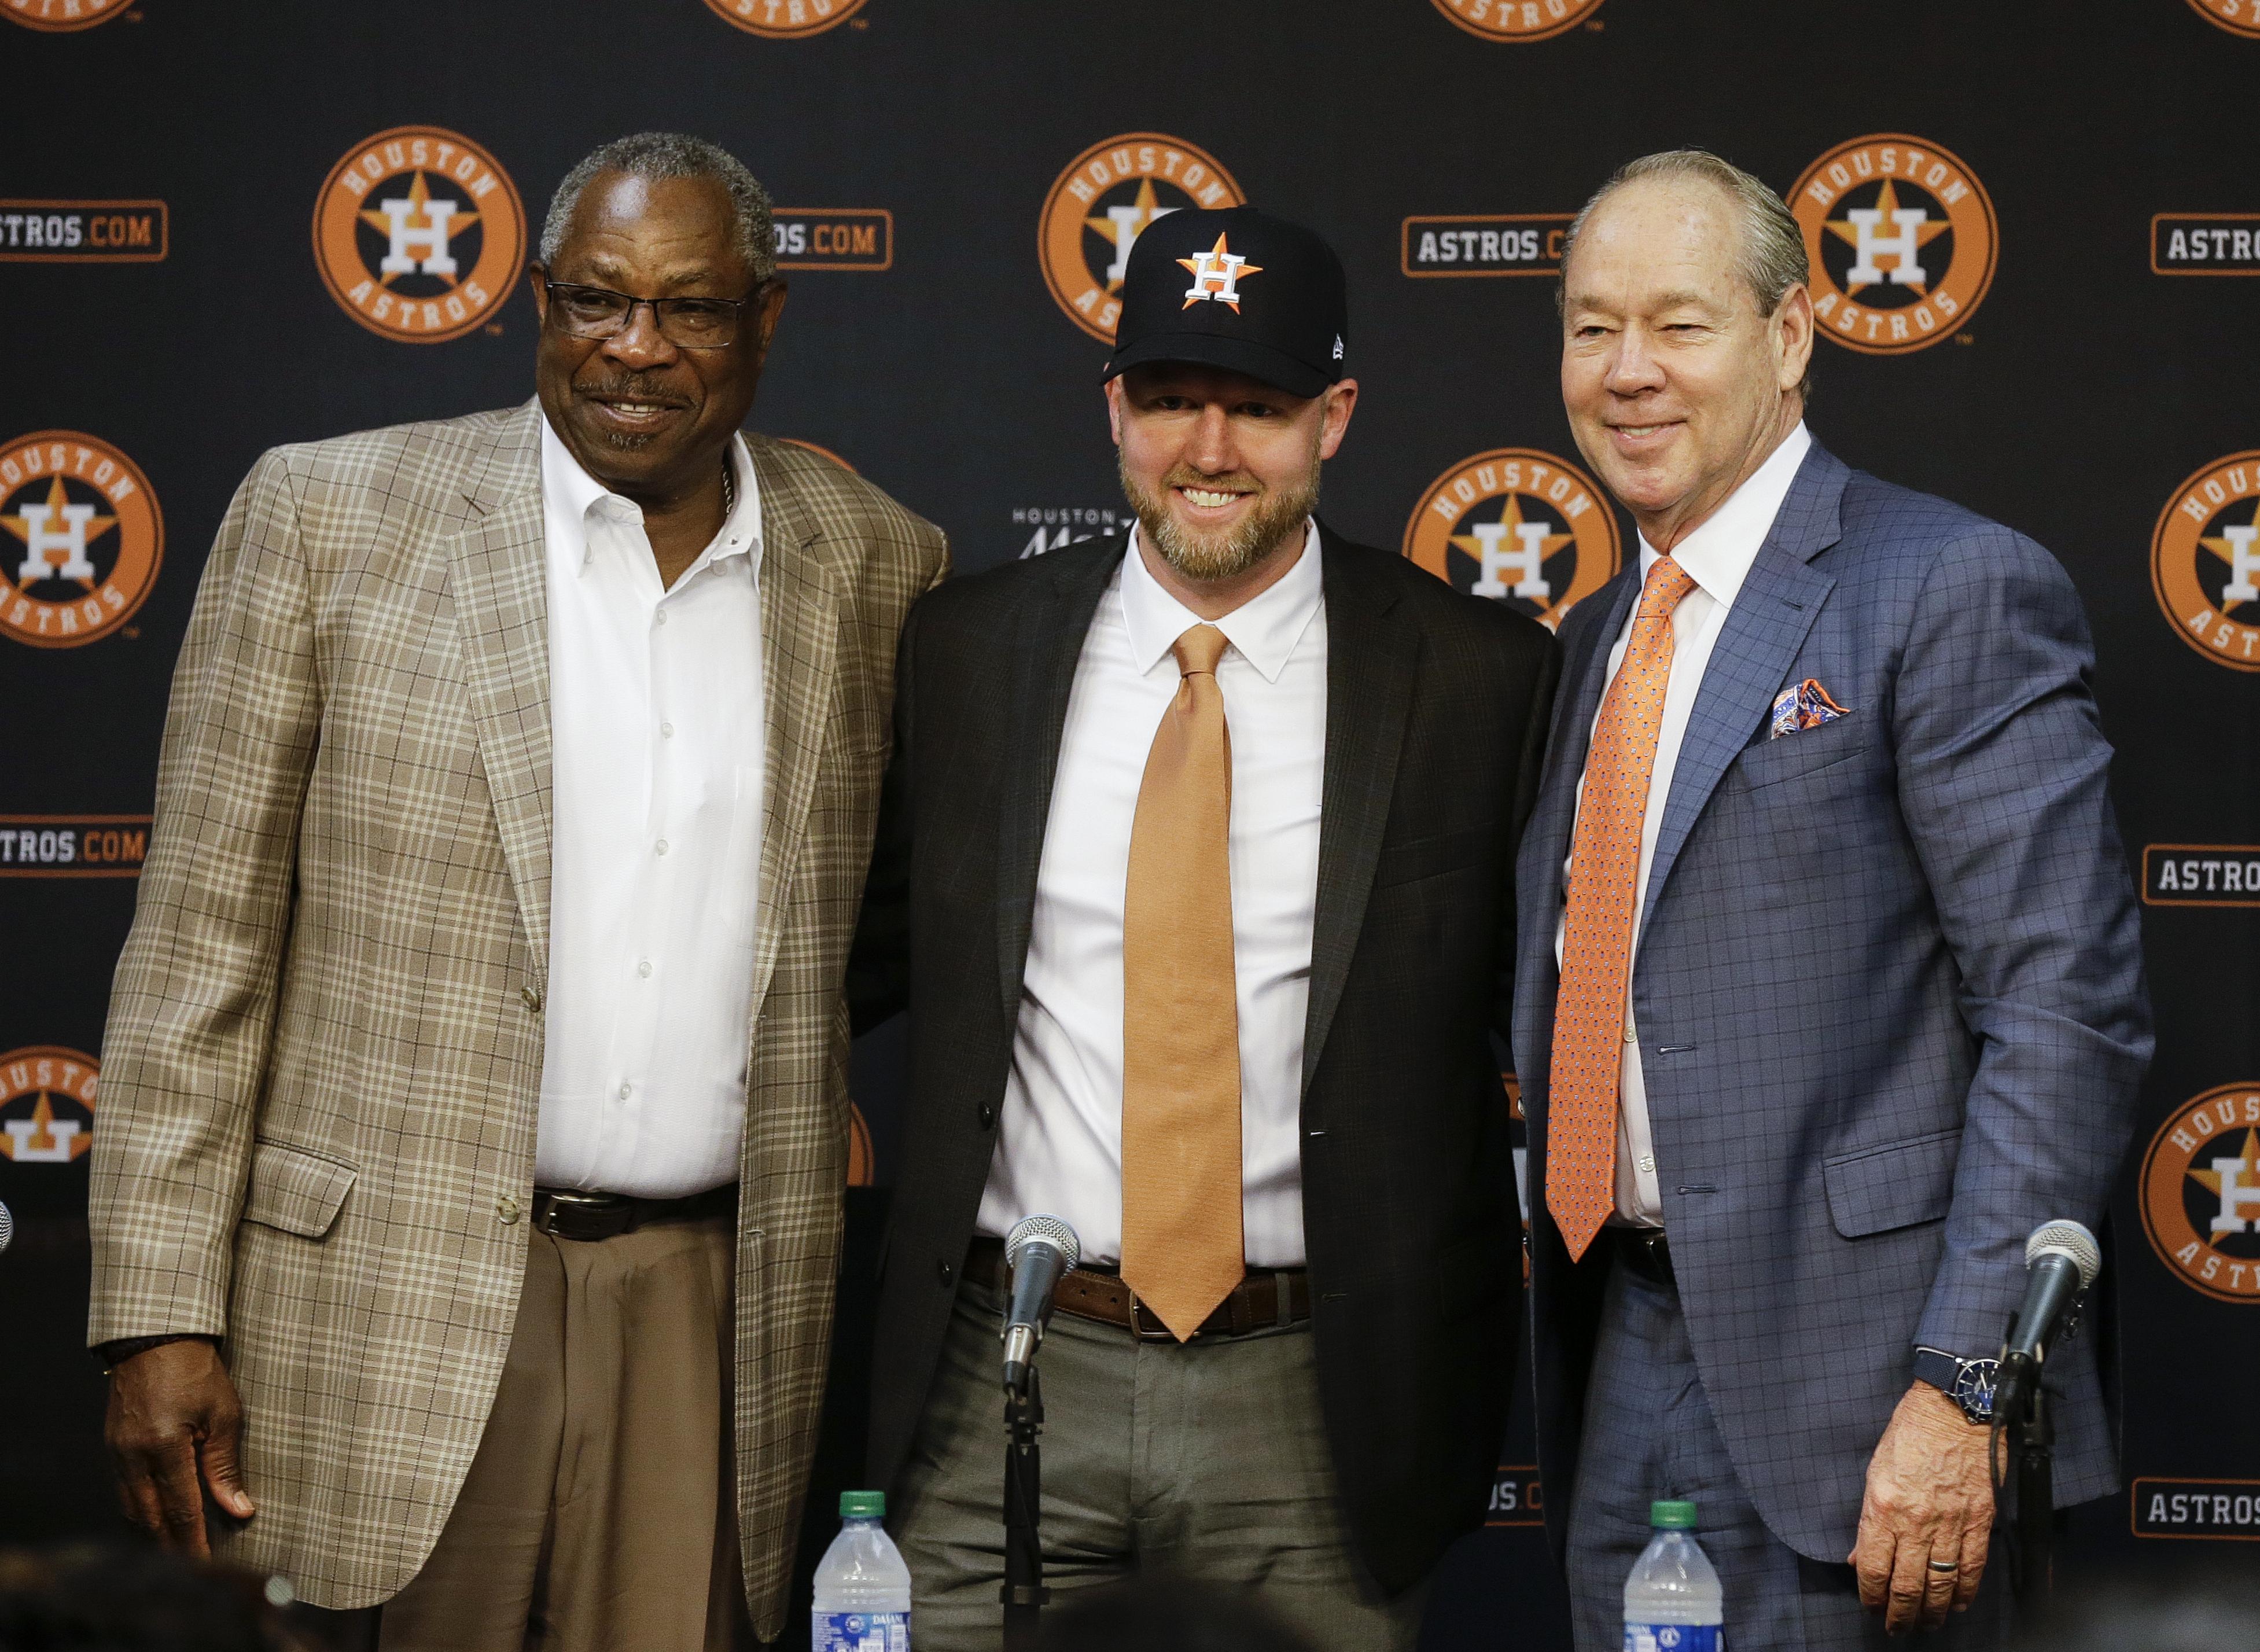 Houston Astros Introduce James Click